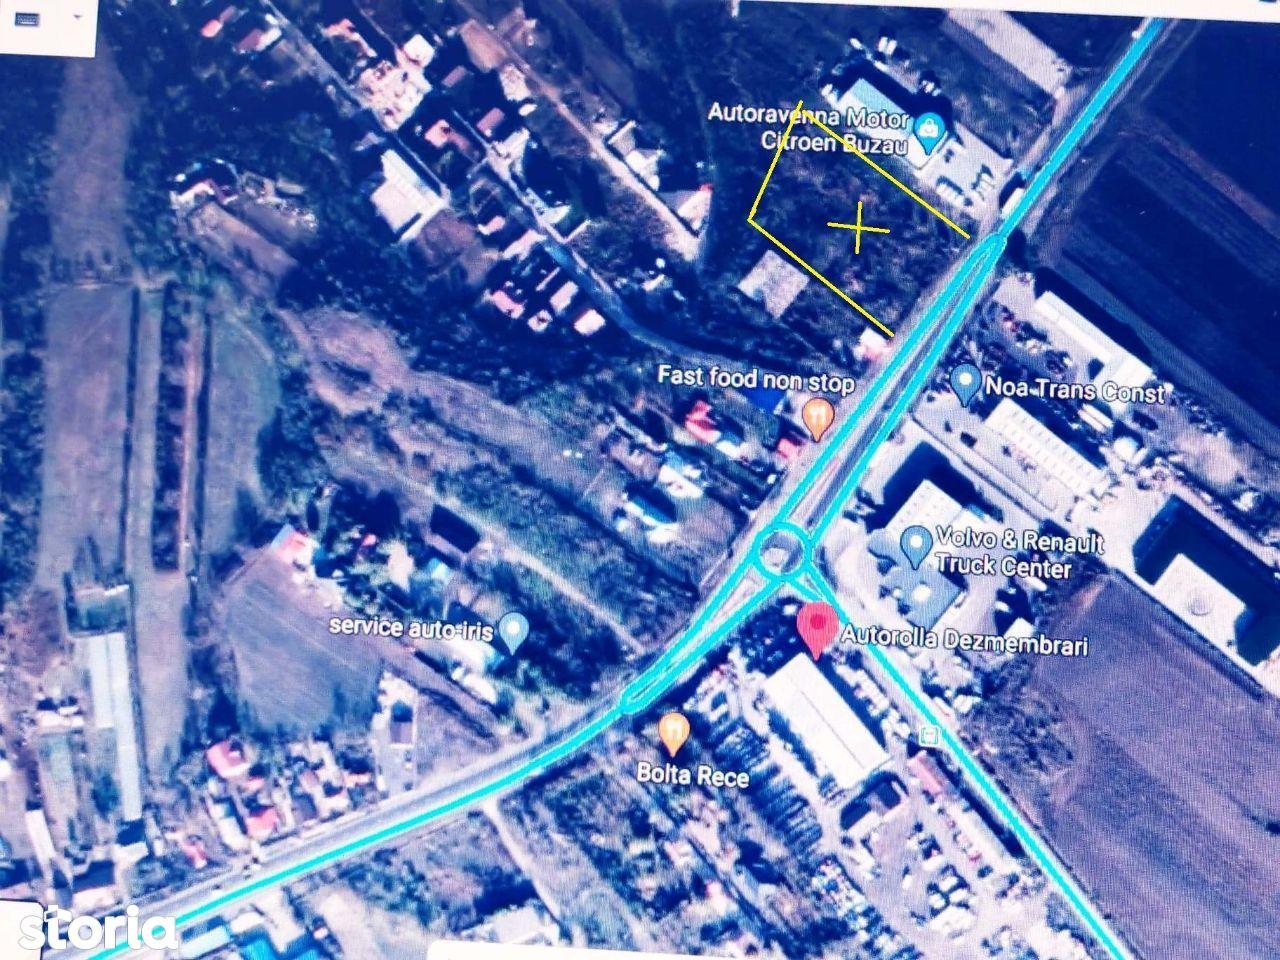 Teren activitati comerciale/industriale/locuinte, Buzau -e85